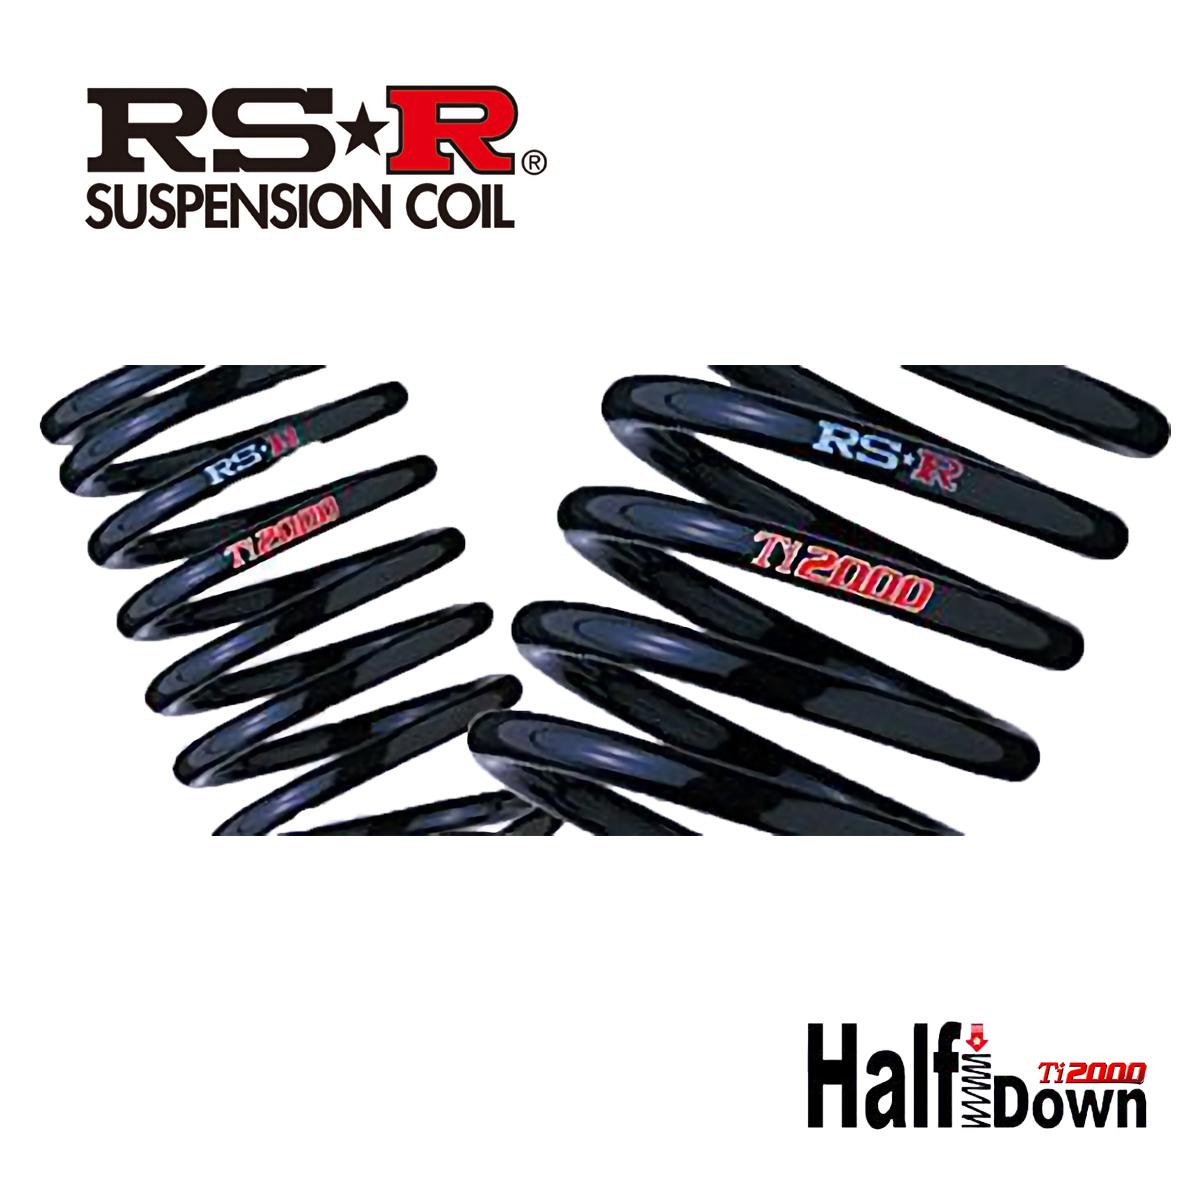 RS-R C-HR G-T NGX50 ダウンサス スプリング フロント T381THDF Ti2000 ハーフダウン RSR 個人宅発送追金有